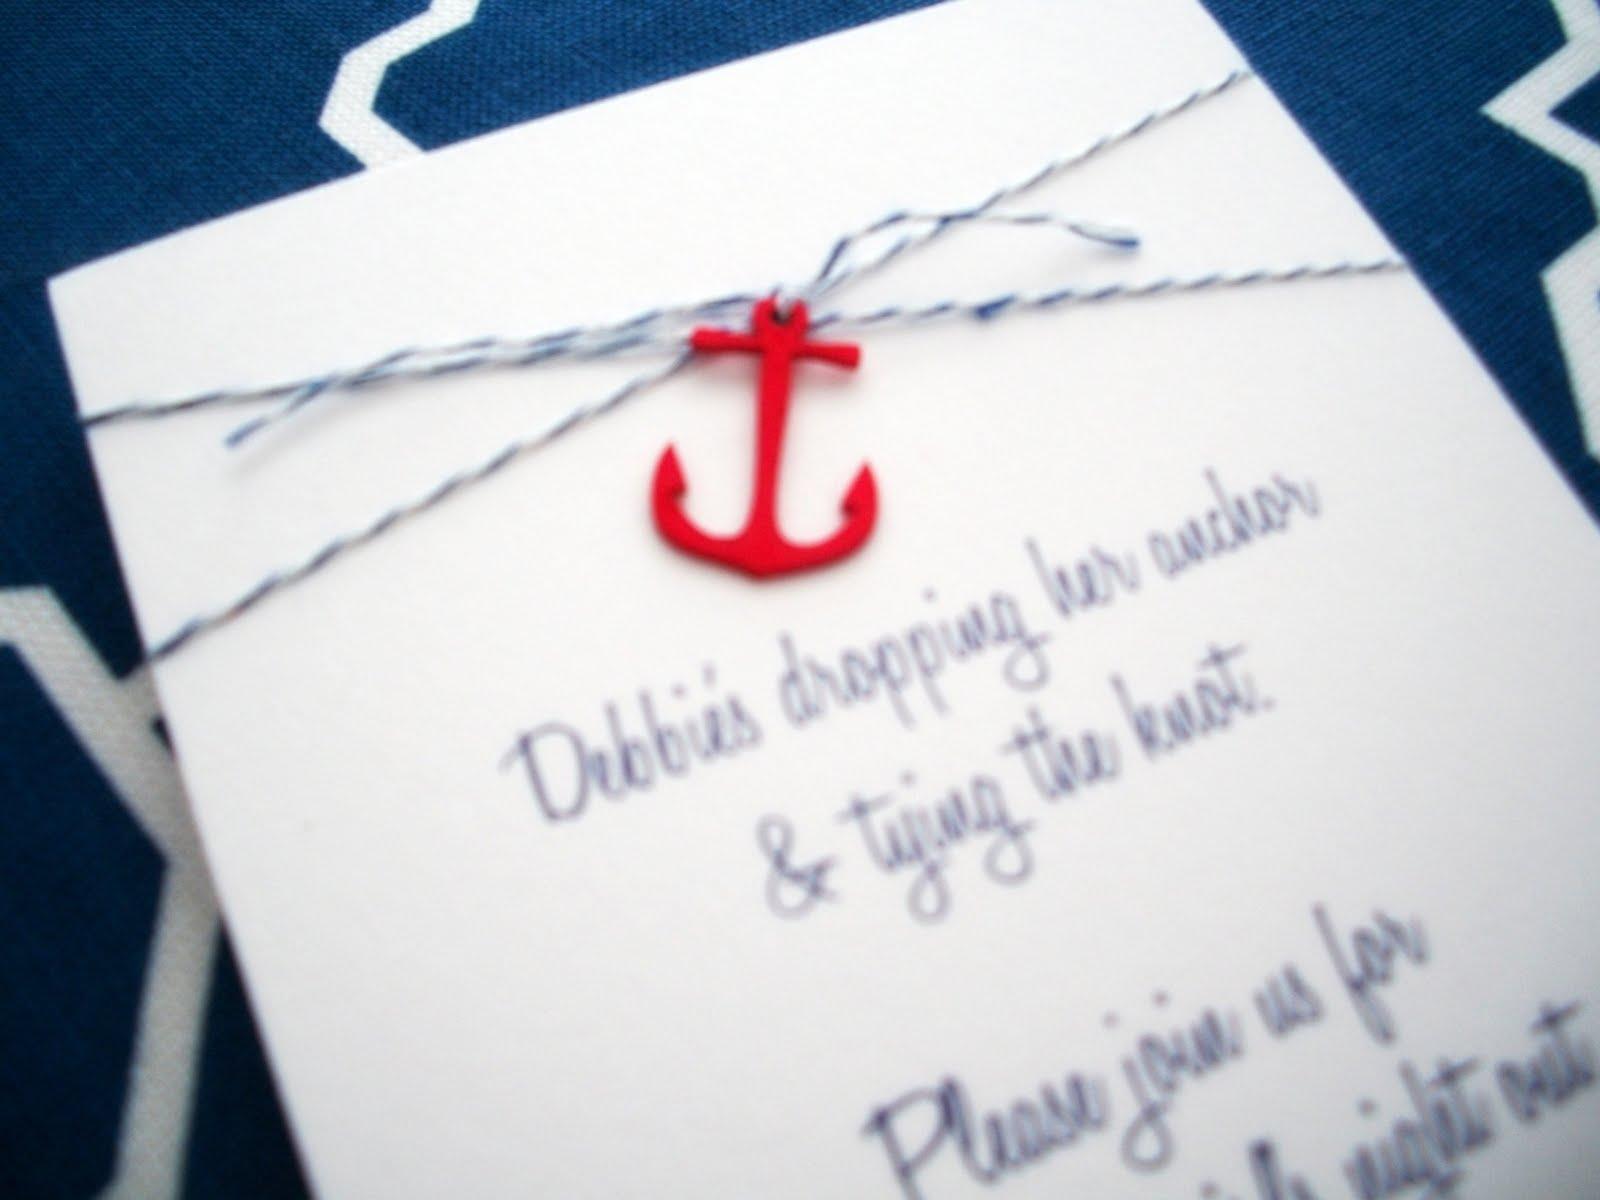 Nautical Wedding Invitation Wording: Monogram Wedding Invitations: Nautical Wedding Invitations